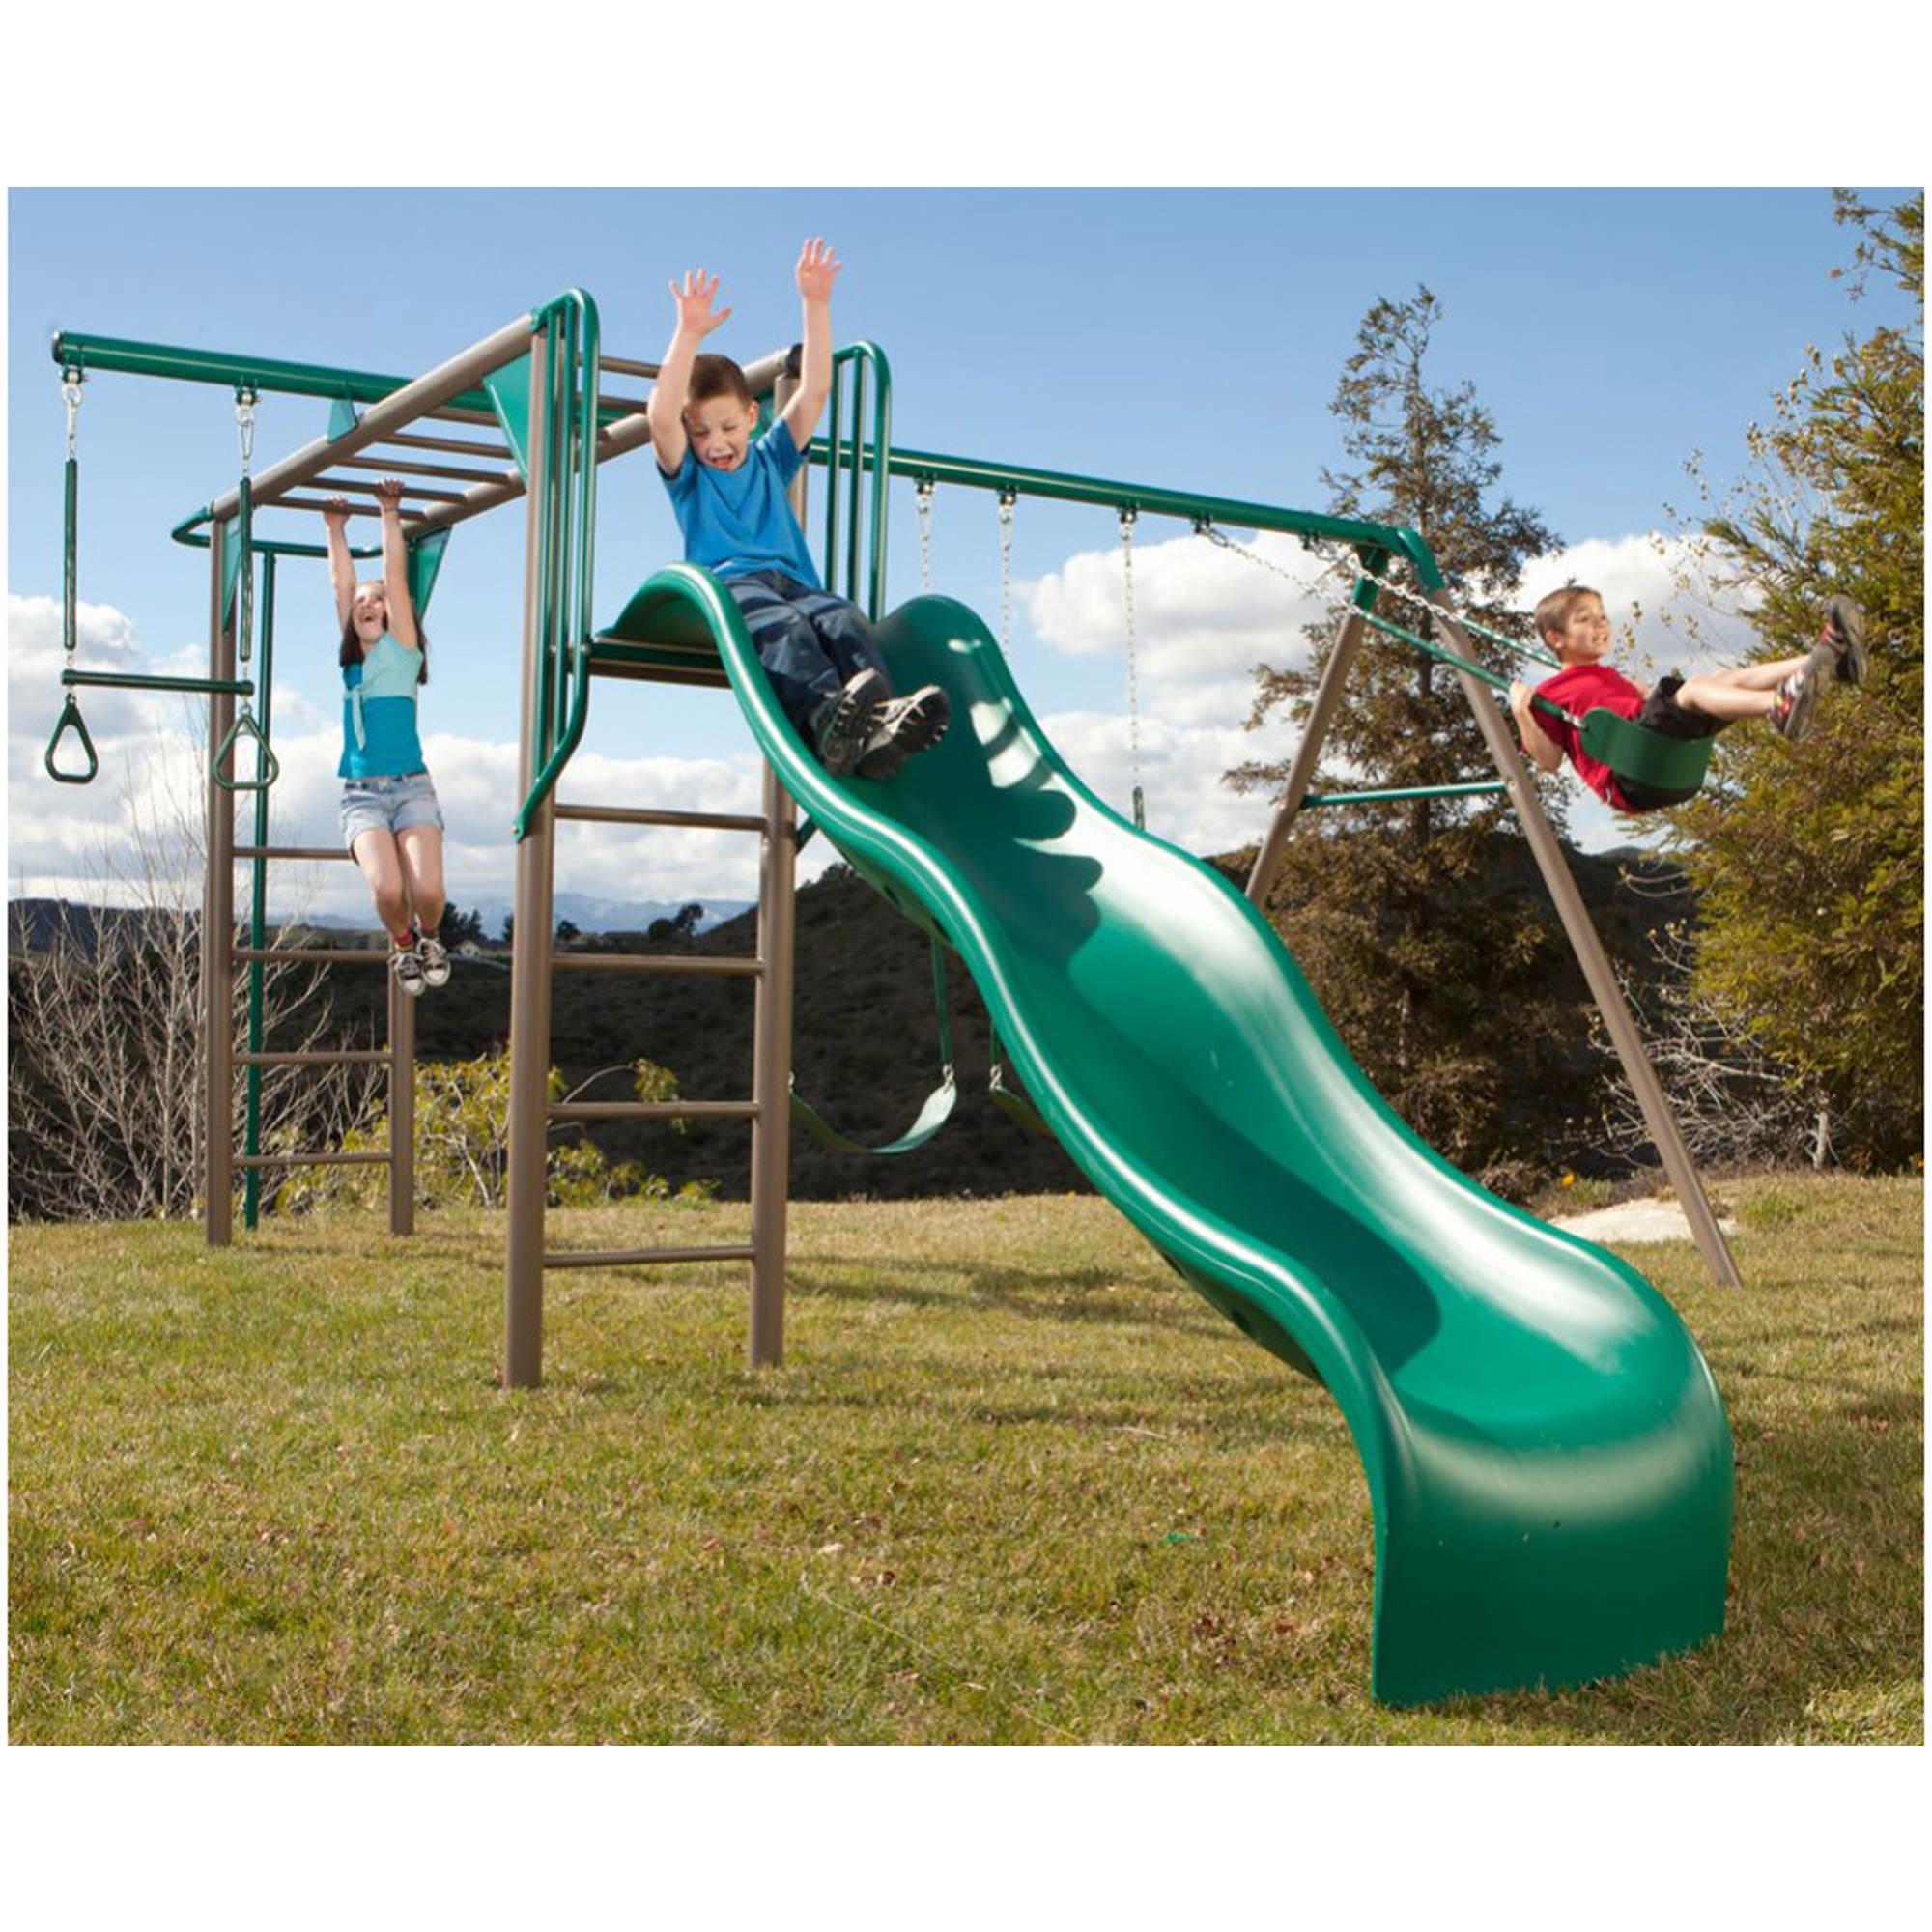 Heavy Duty Playground : Lifetime monkey bars adventure heavy duty metal swing set